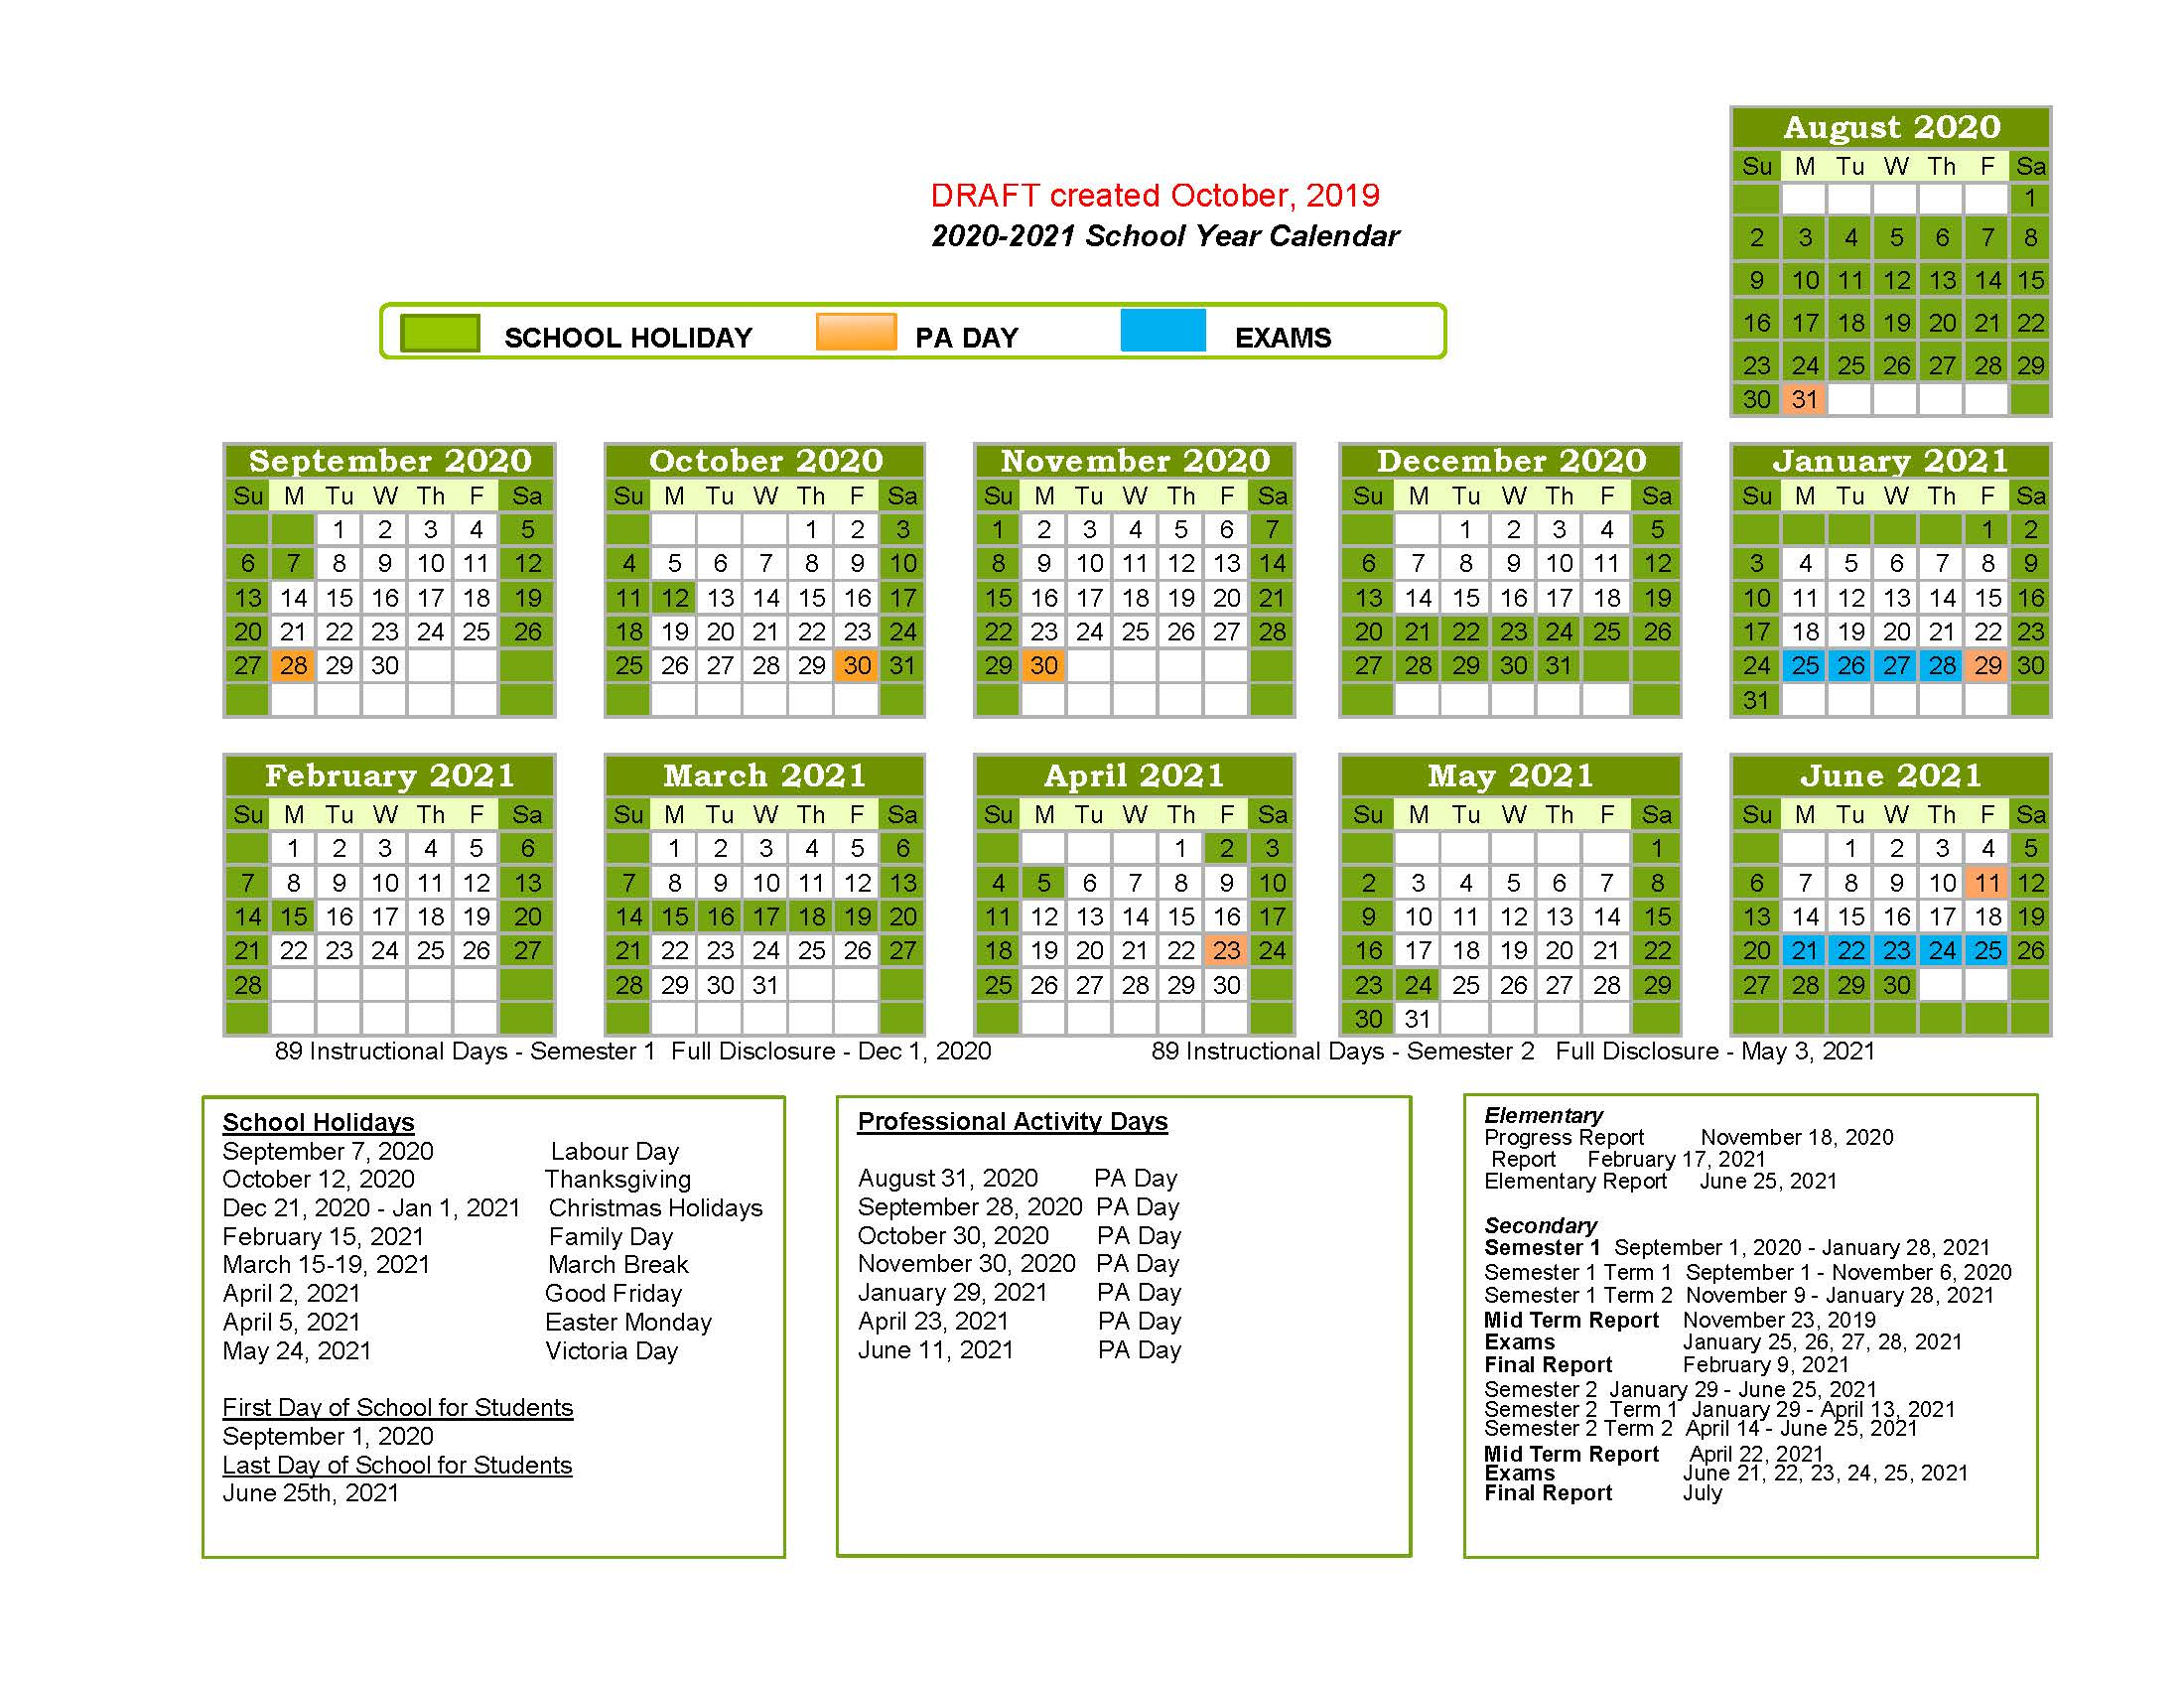 Calendrier Scolaire 2020 Et 2021.2020 2021 Proposed School Year Calendar Consultations